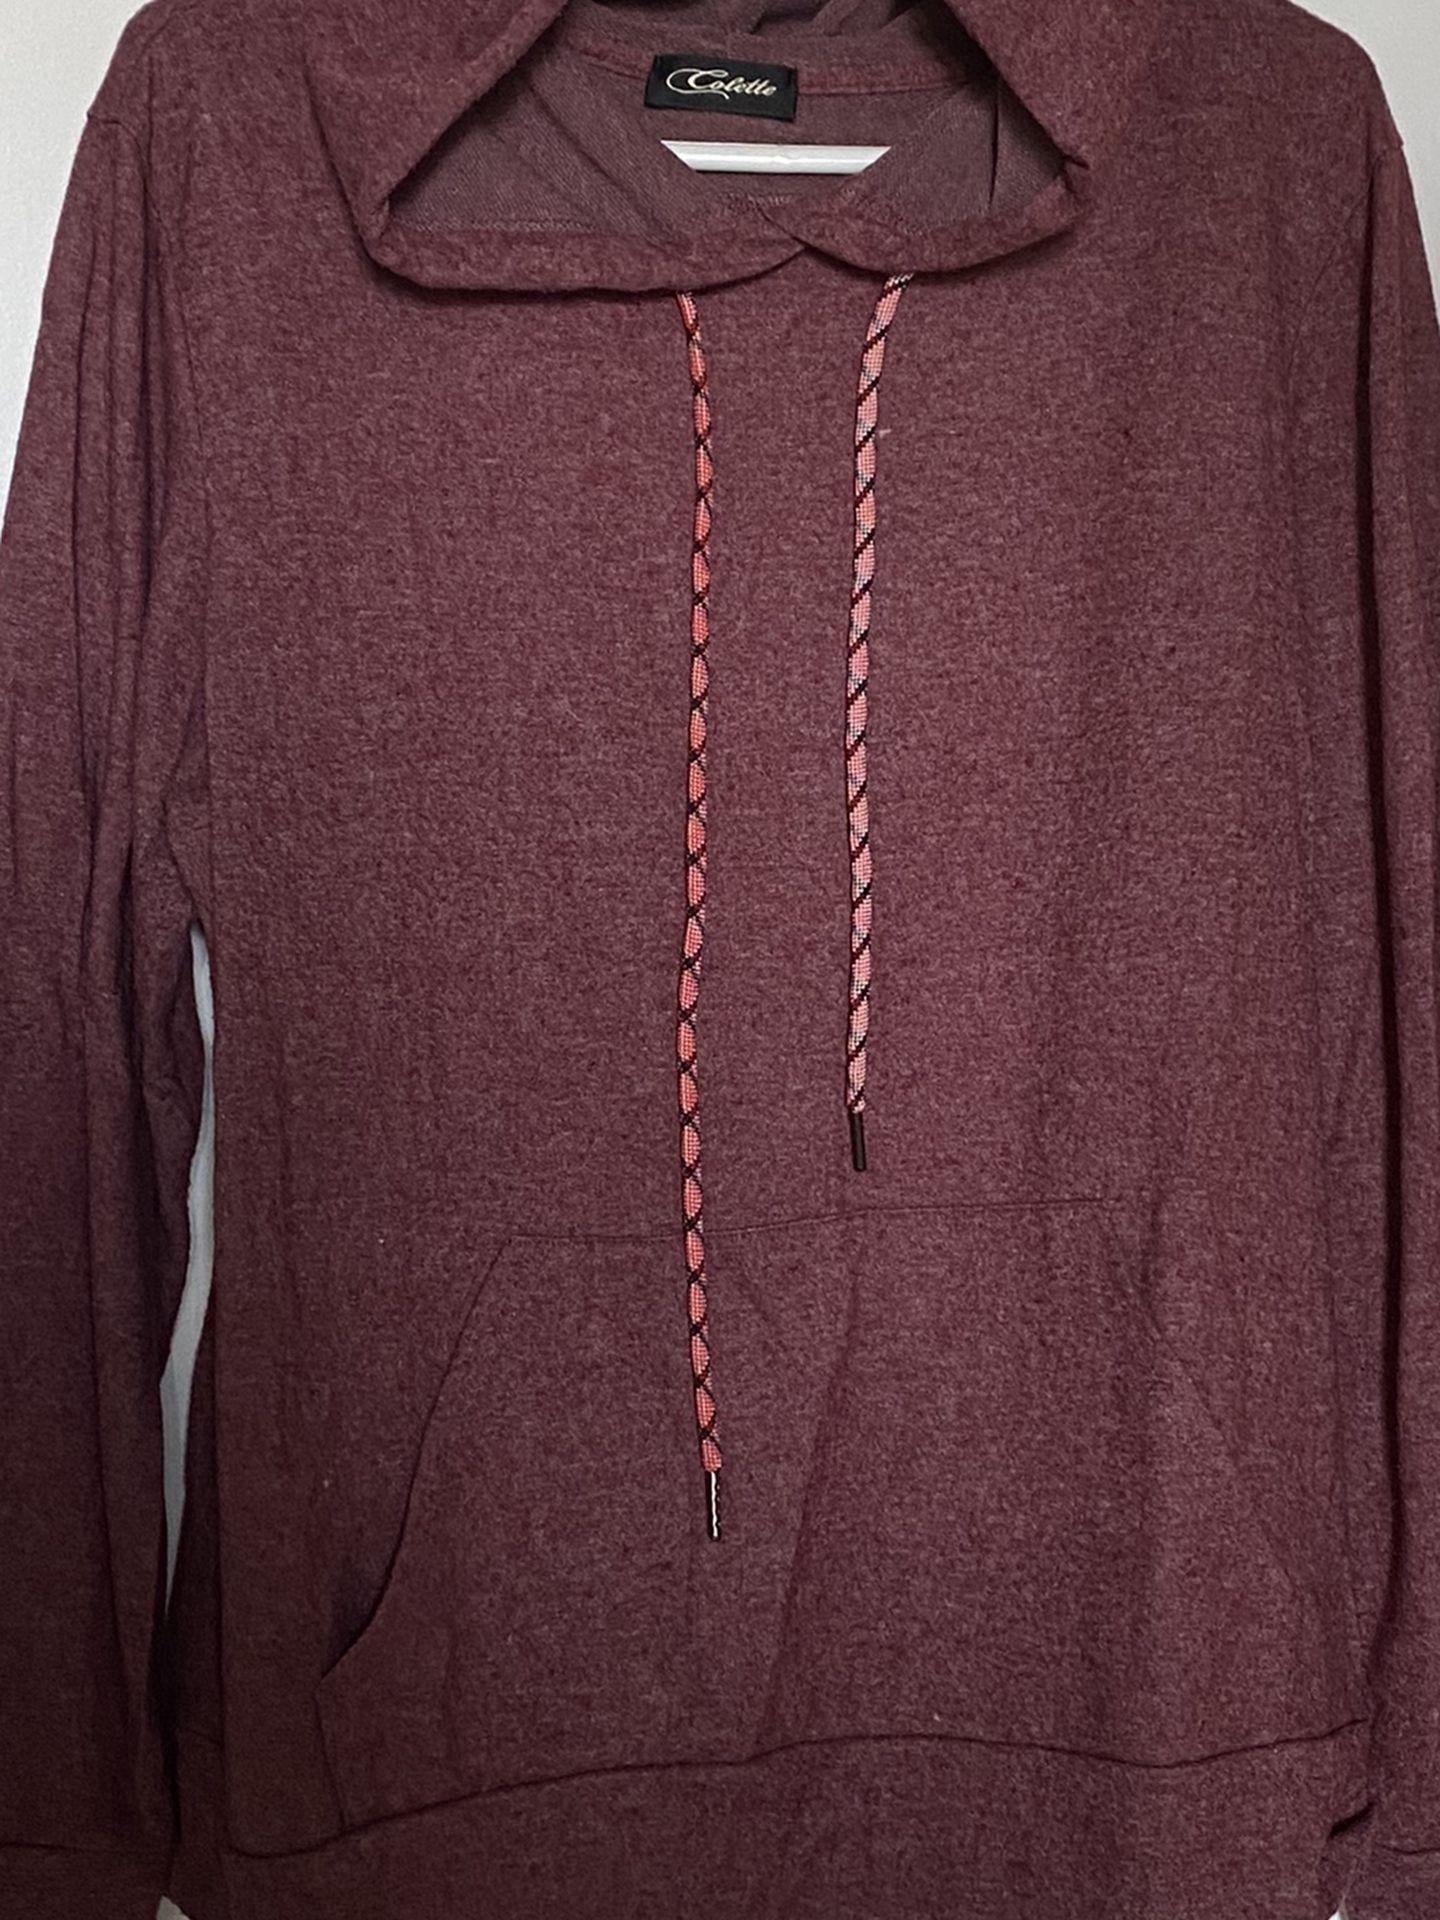 Soft Burgendy Sweatshirt